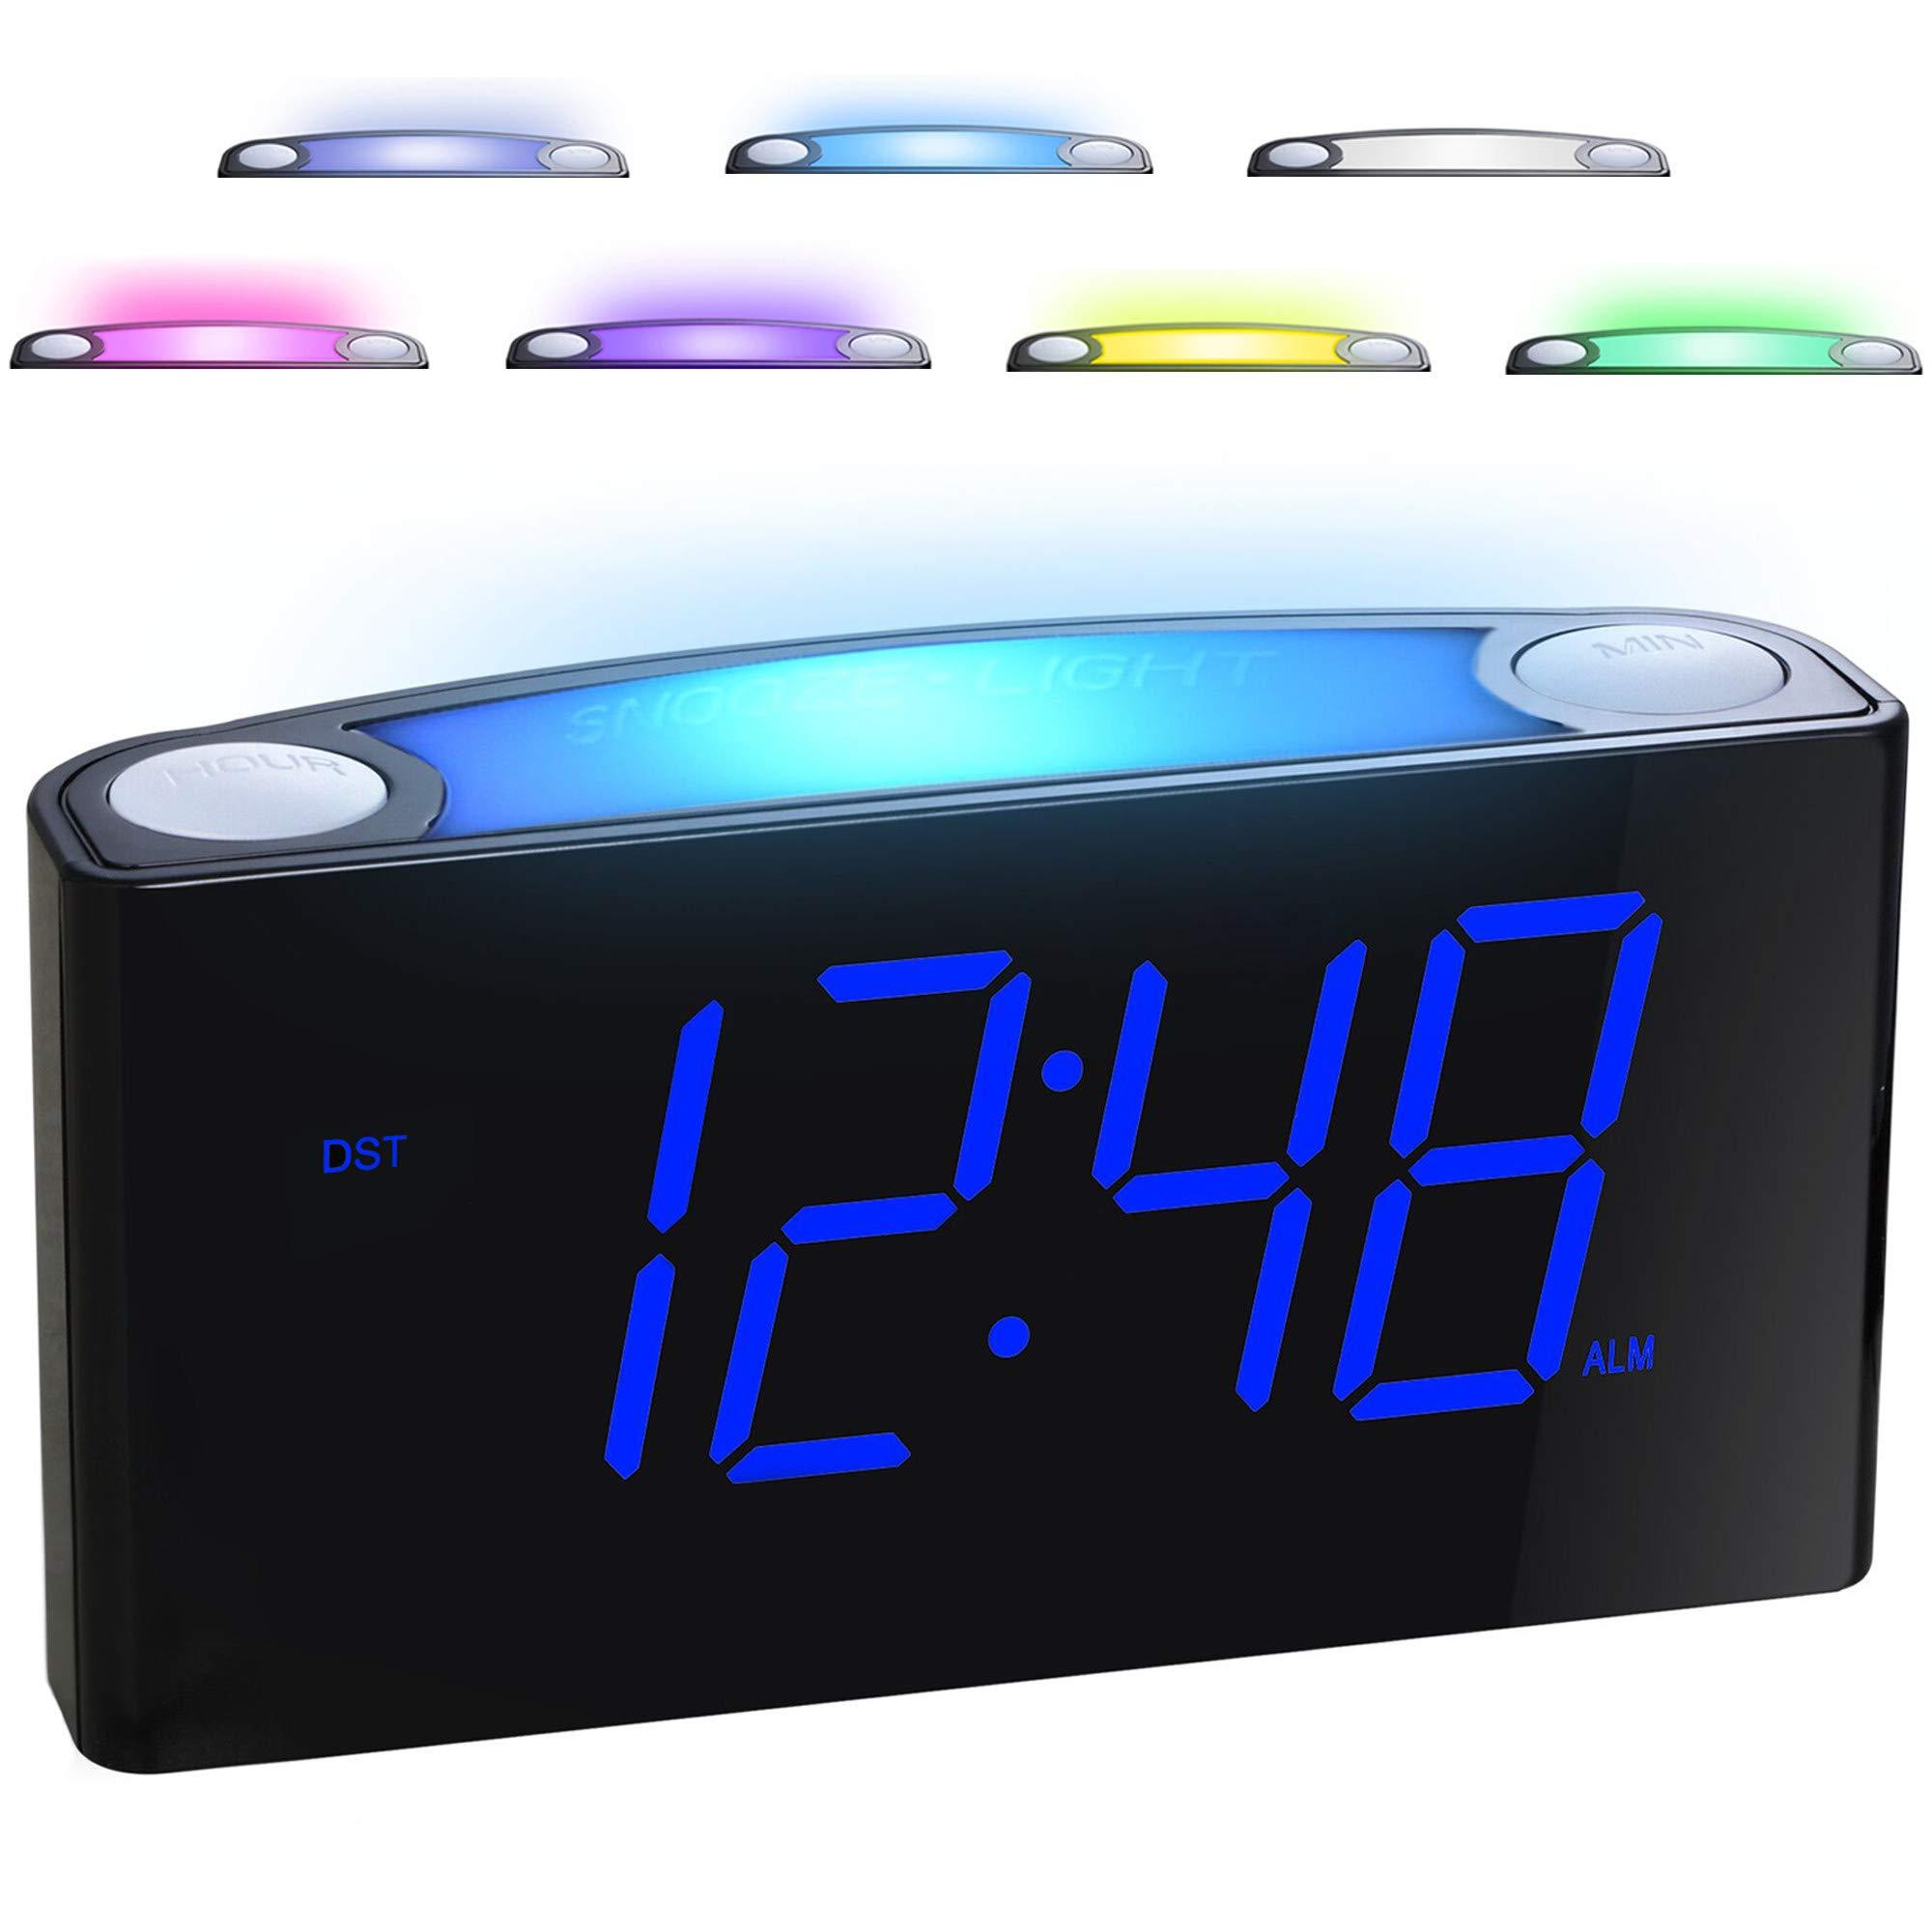 Mesqool Digital Alarm Clock Chargers